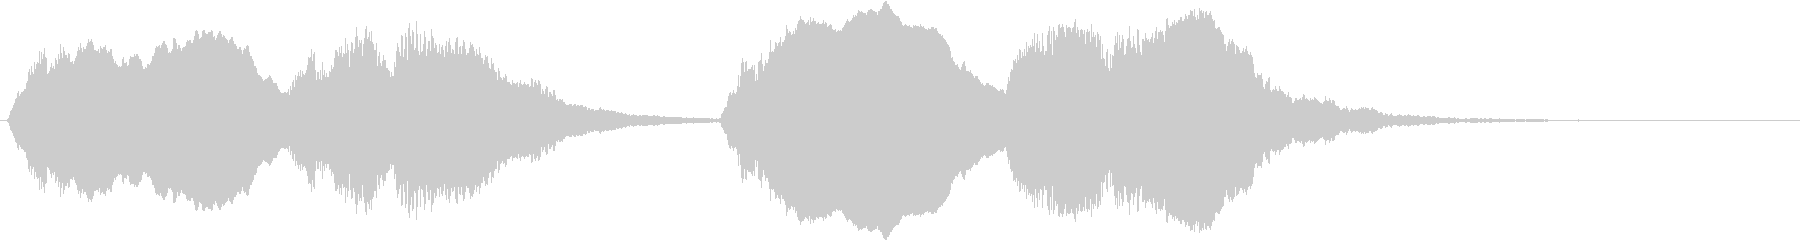 J・S・バッハ作「トッカータとフーガ …の未再生の波形